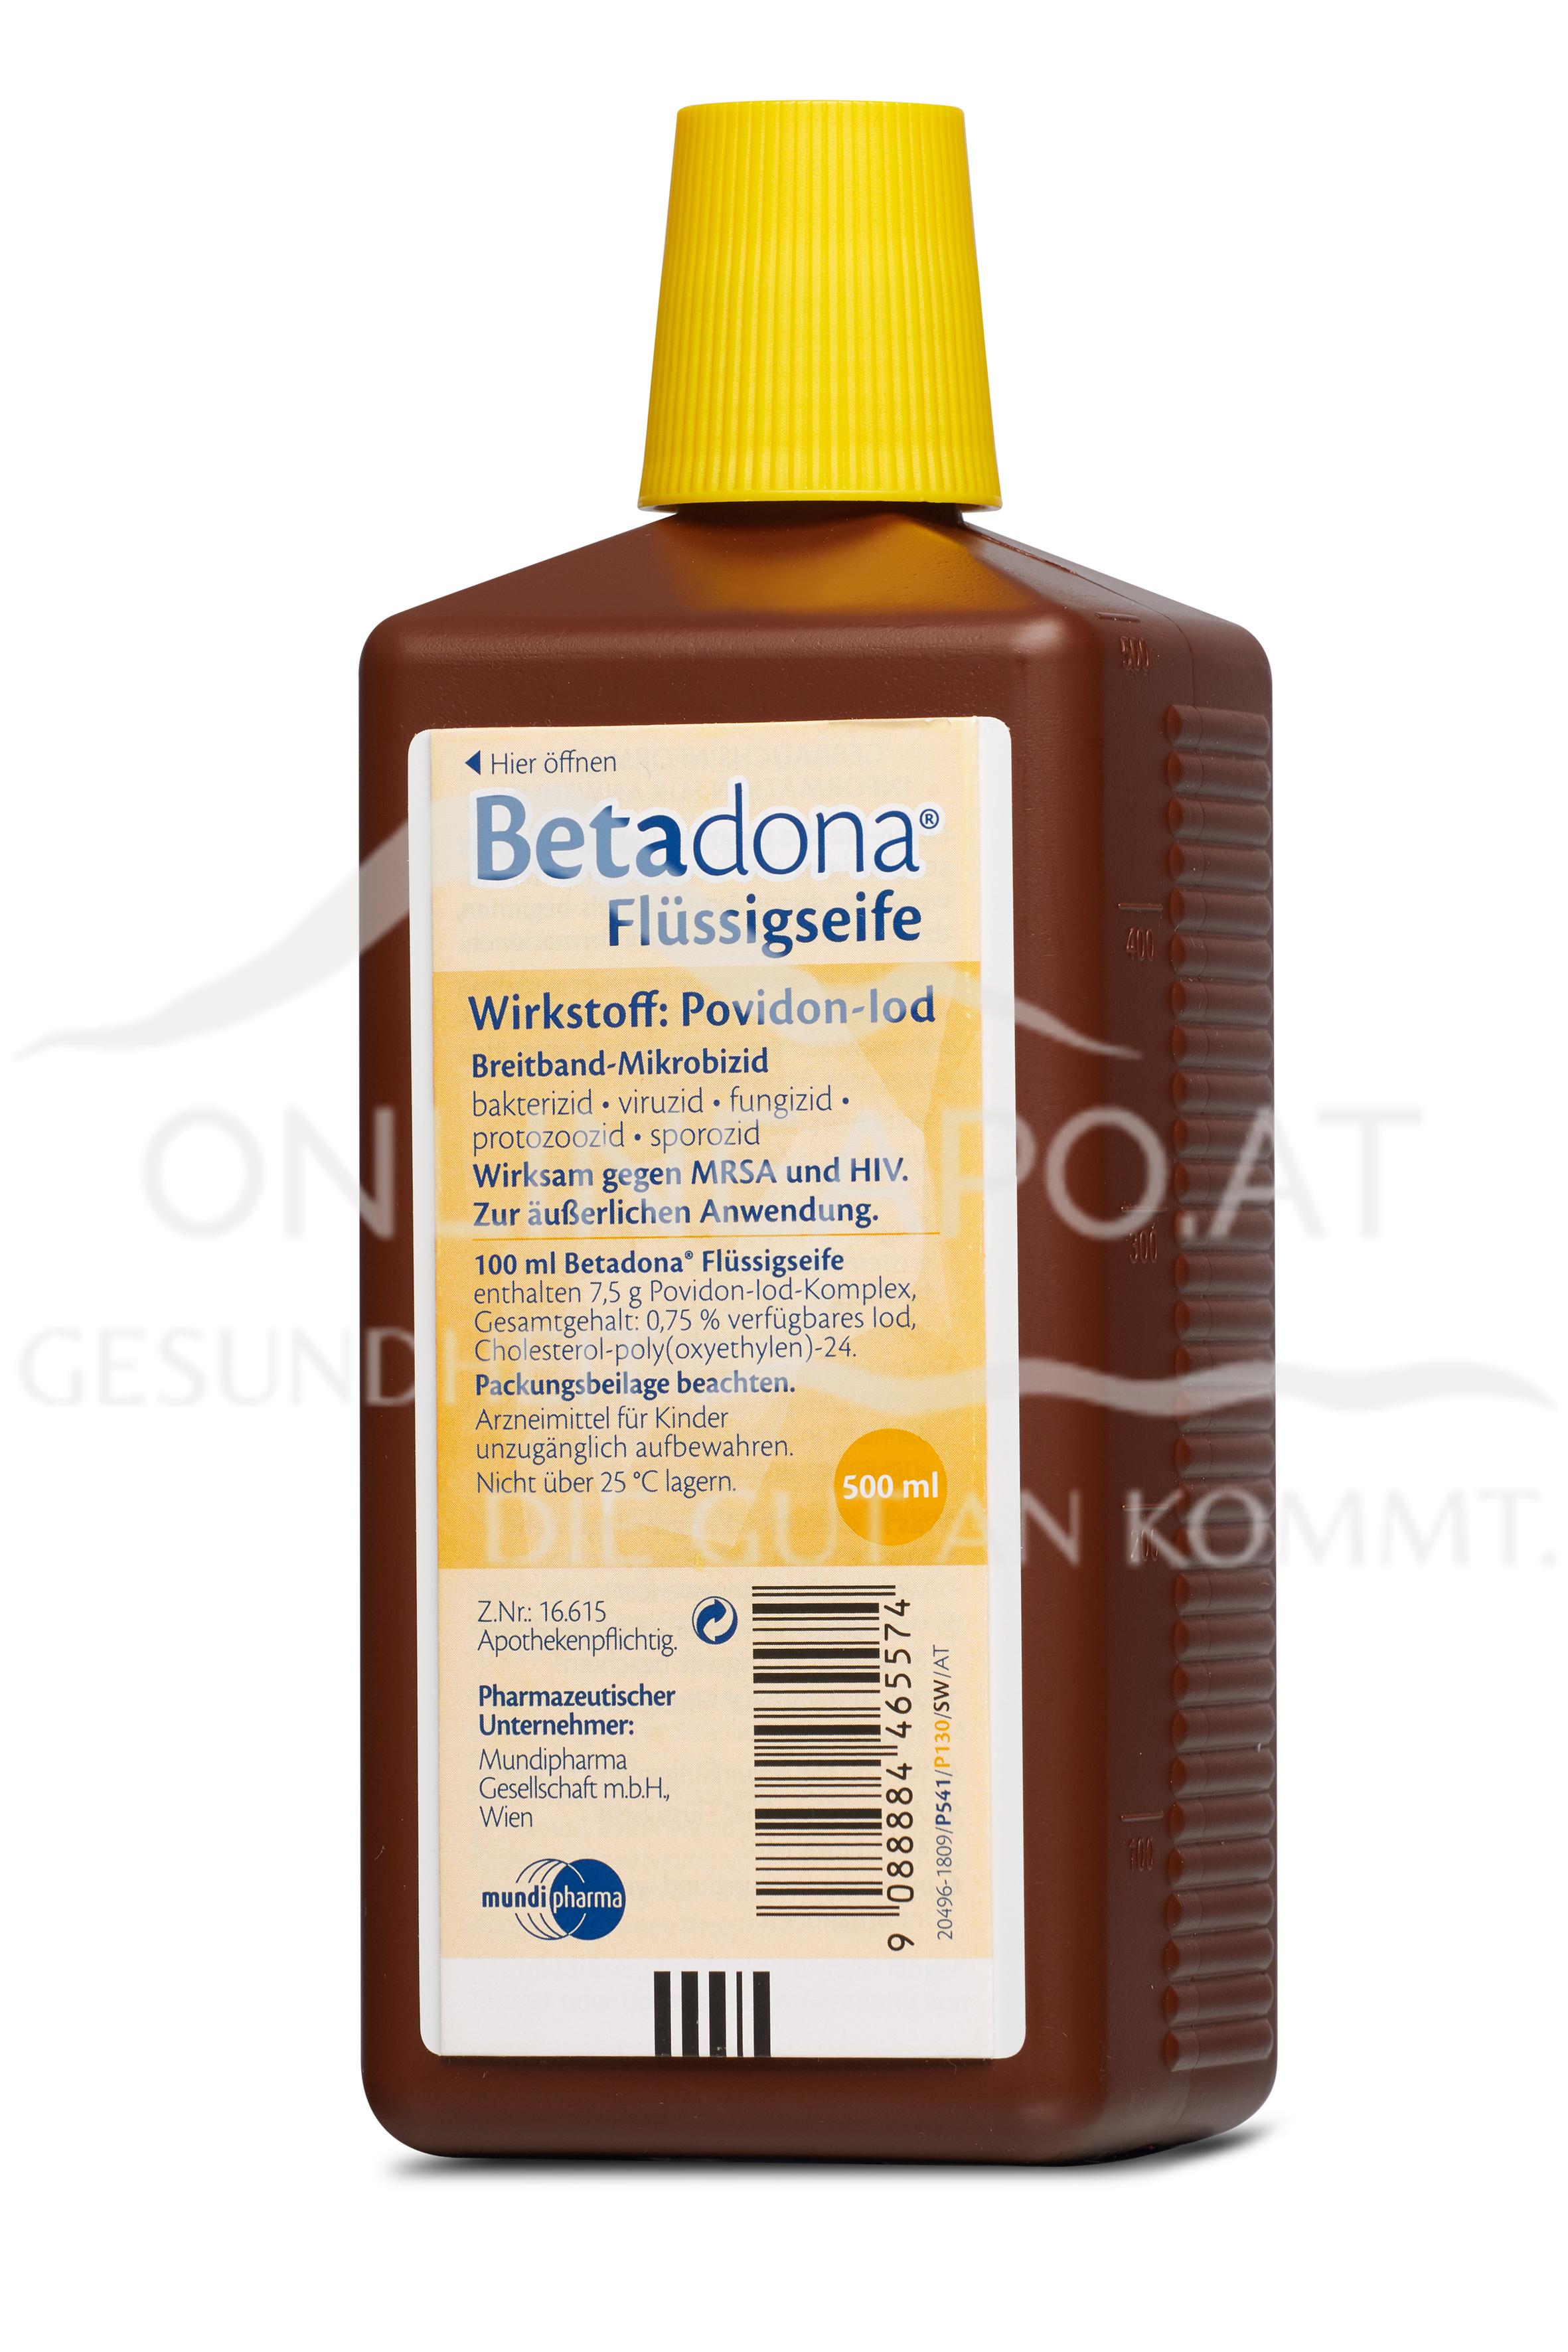 Betadona® Flüssigseife